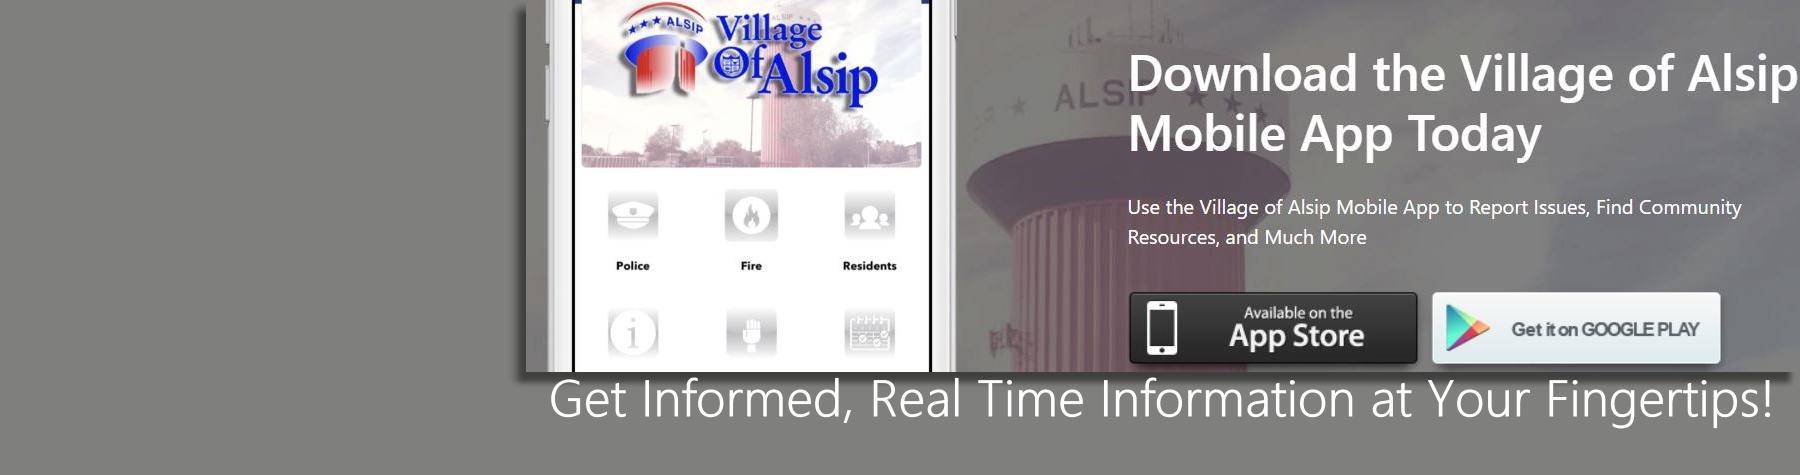 New! Village Of Alsip Mobile App